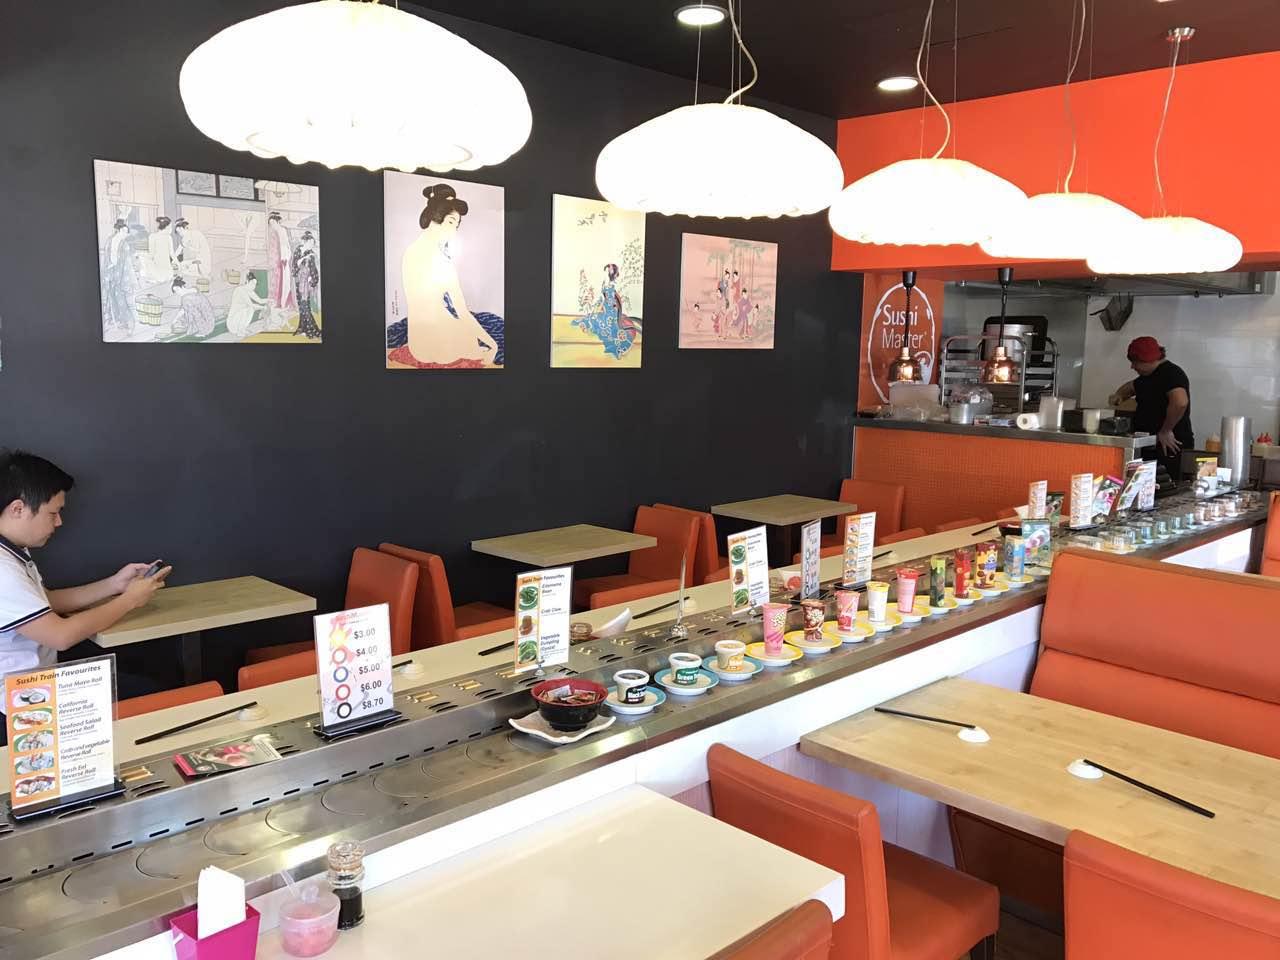 <UNDER OFFER> Innaloo Restaurant, get your money back in a year